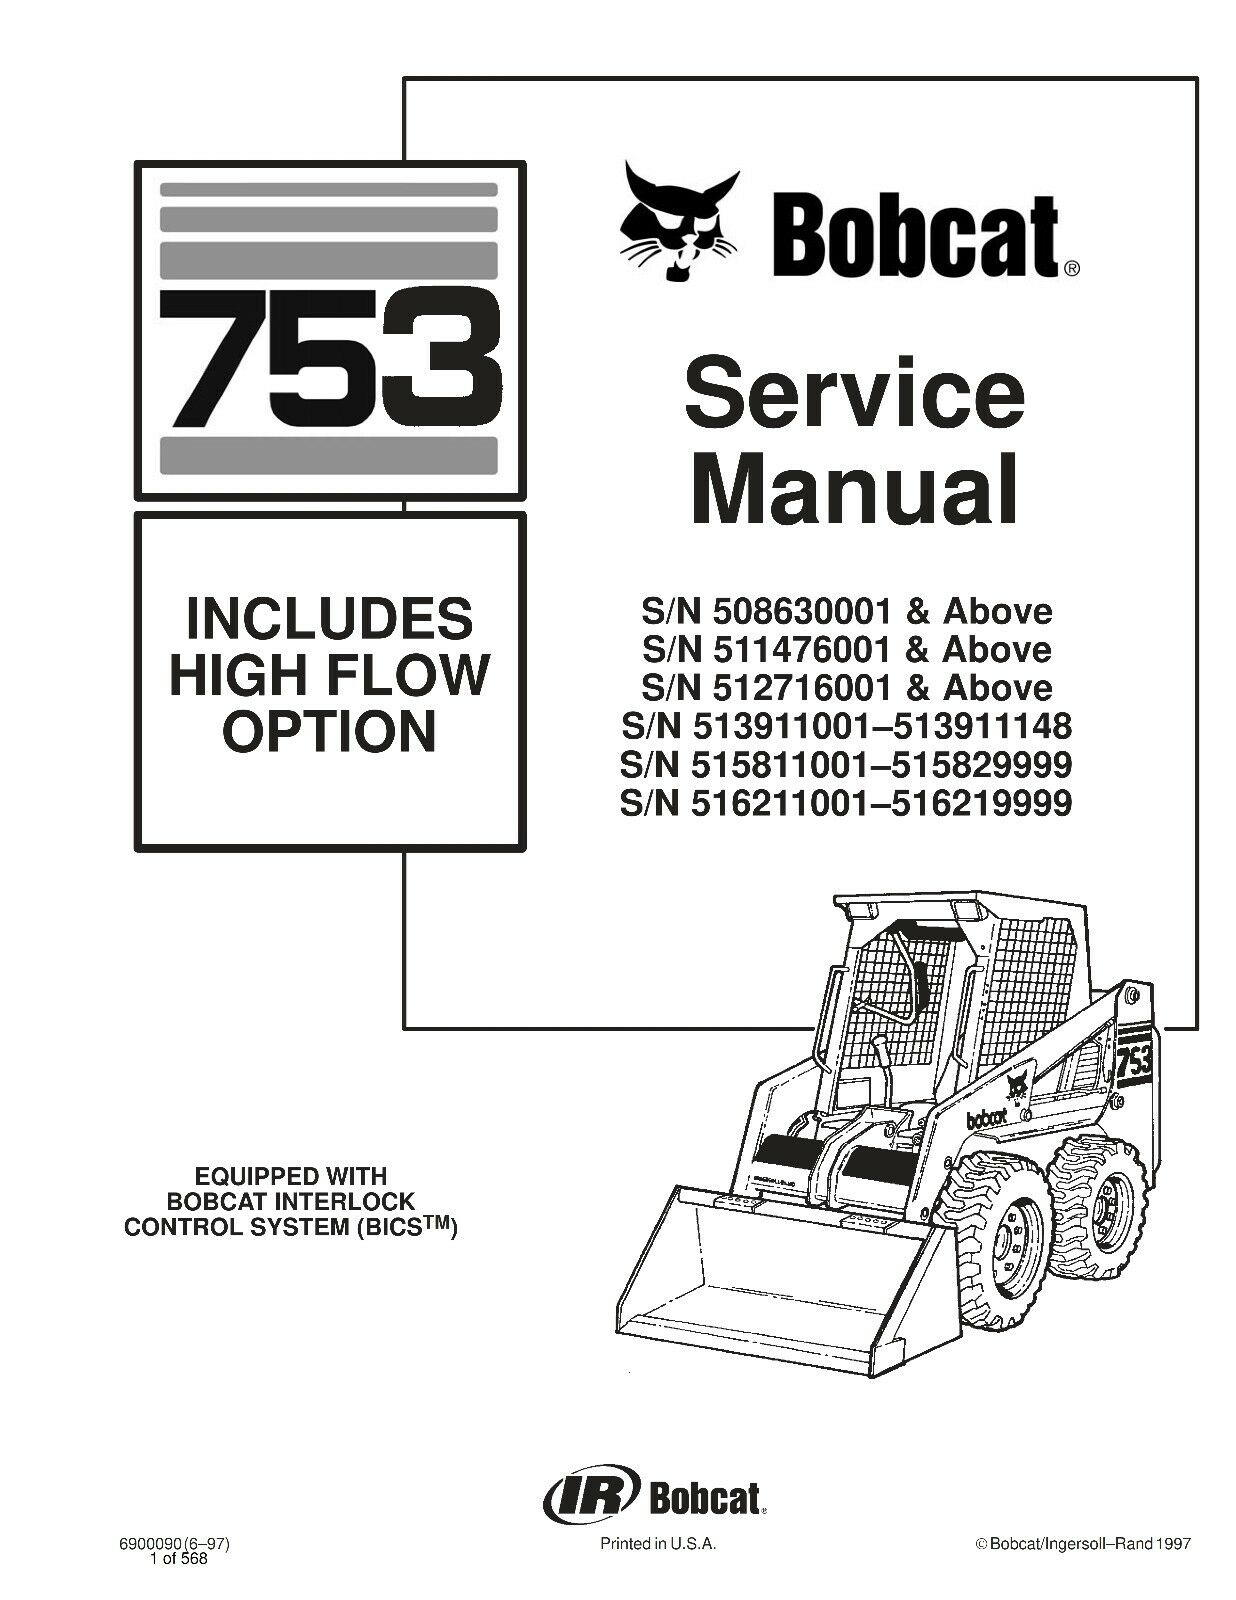 bobcat 753 wiring diagram manual image collections